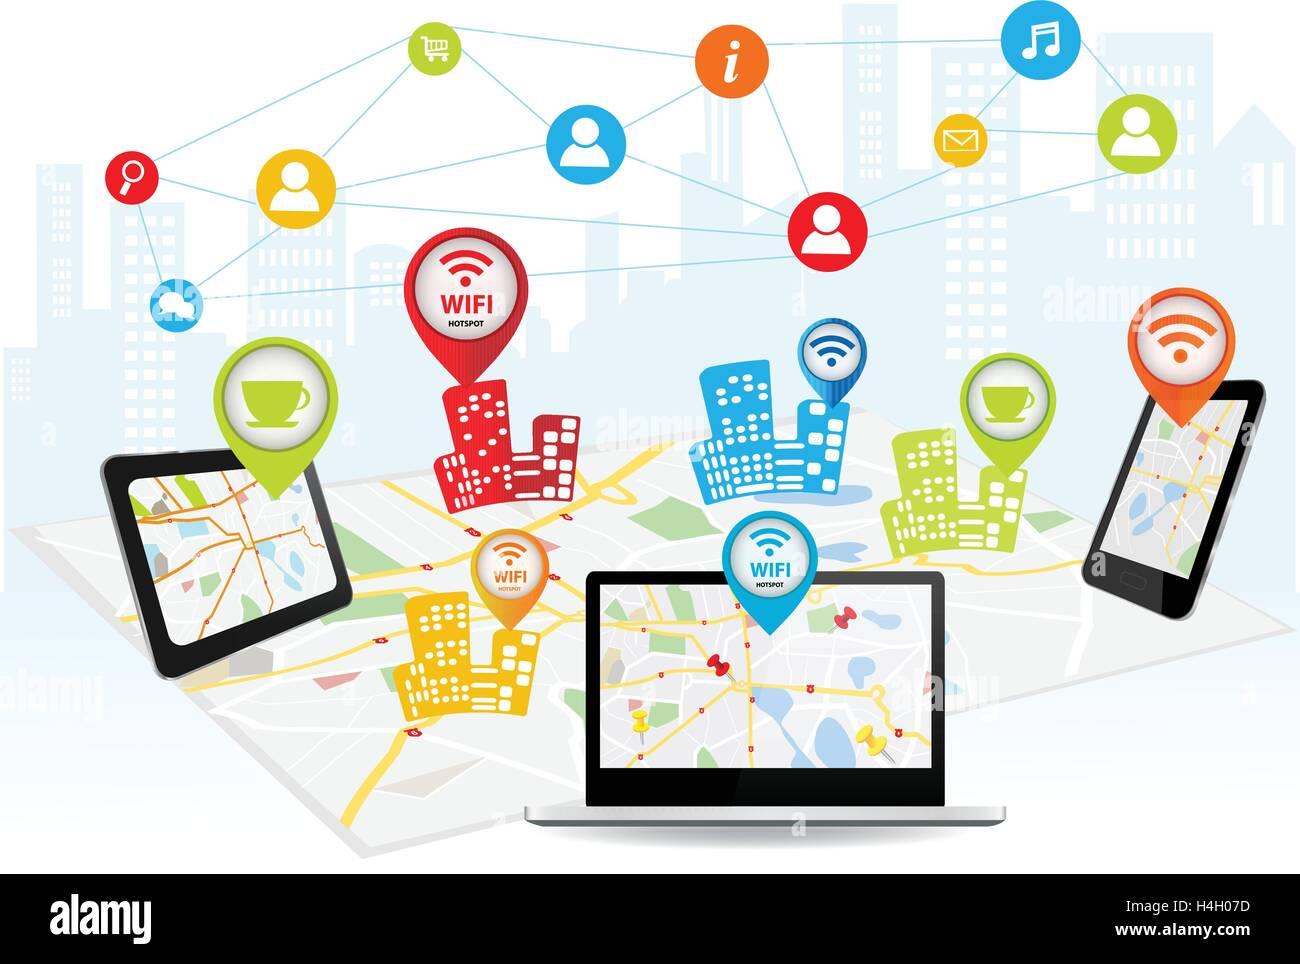 Wireless information transfer across modern gadgets - Stock Image